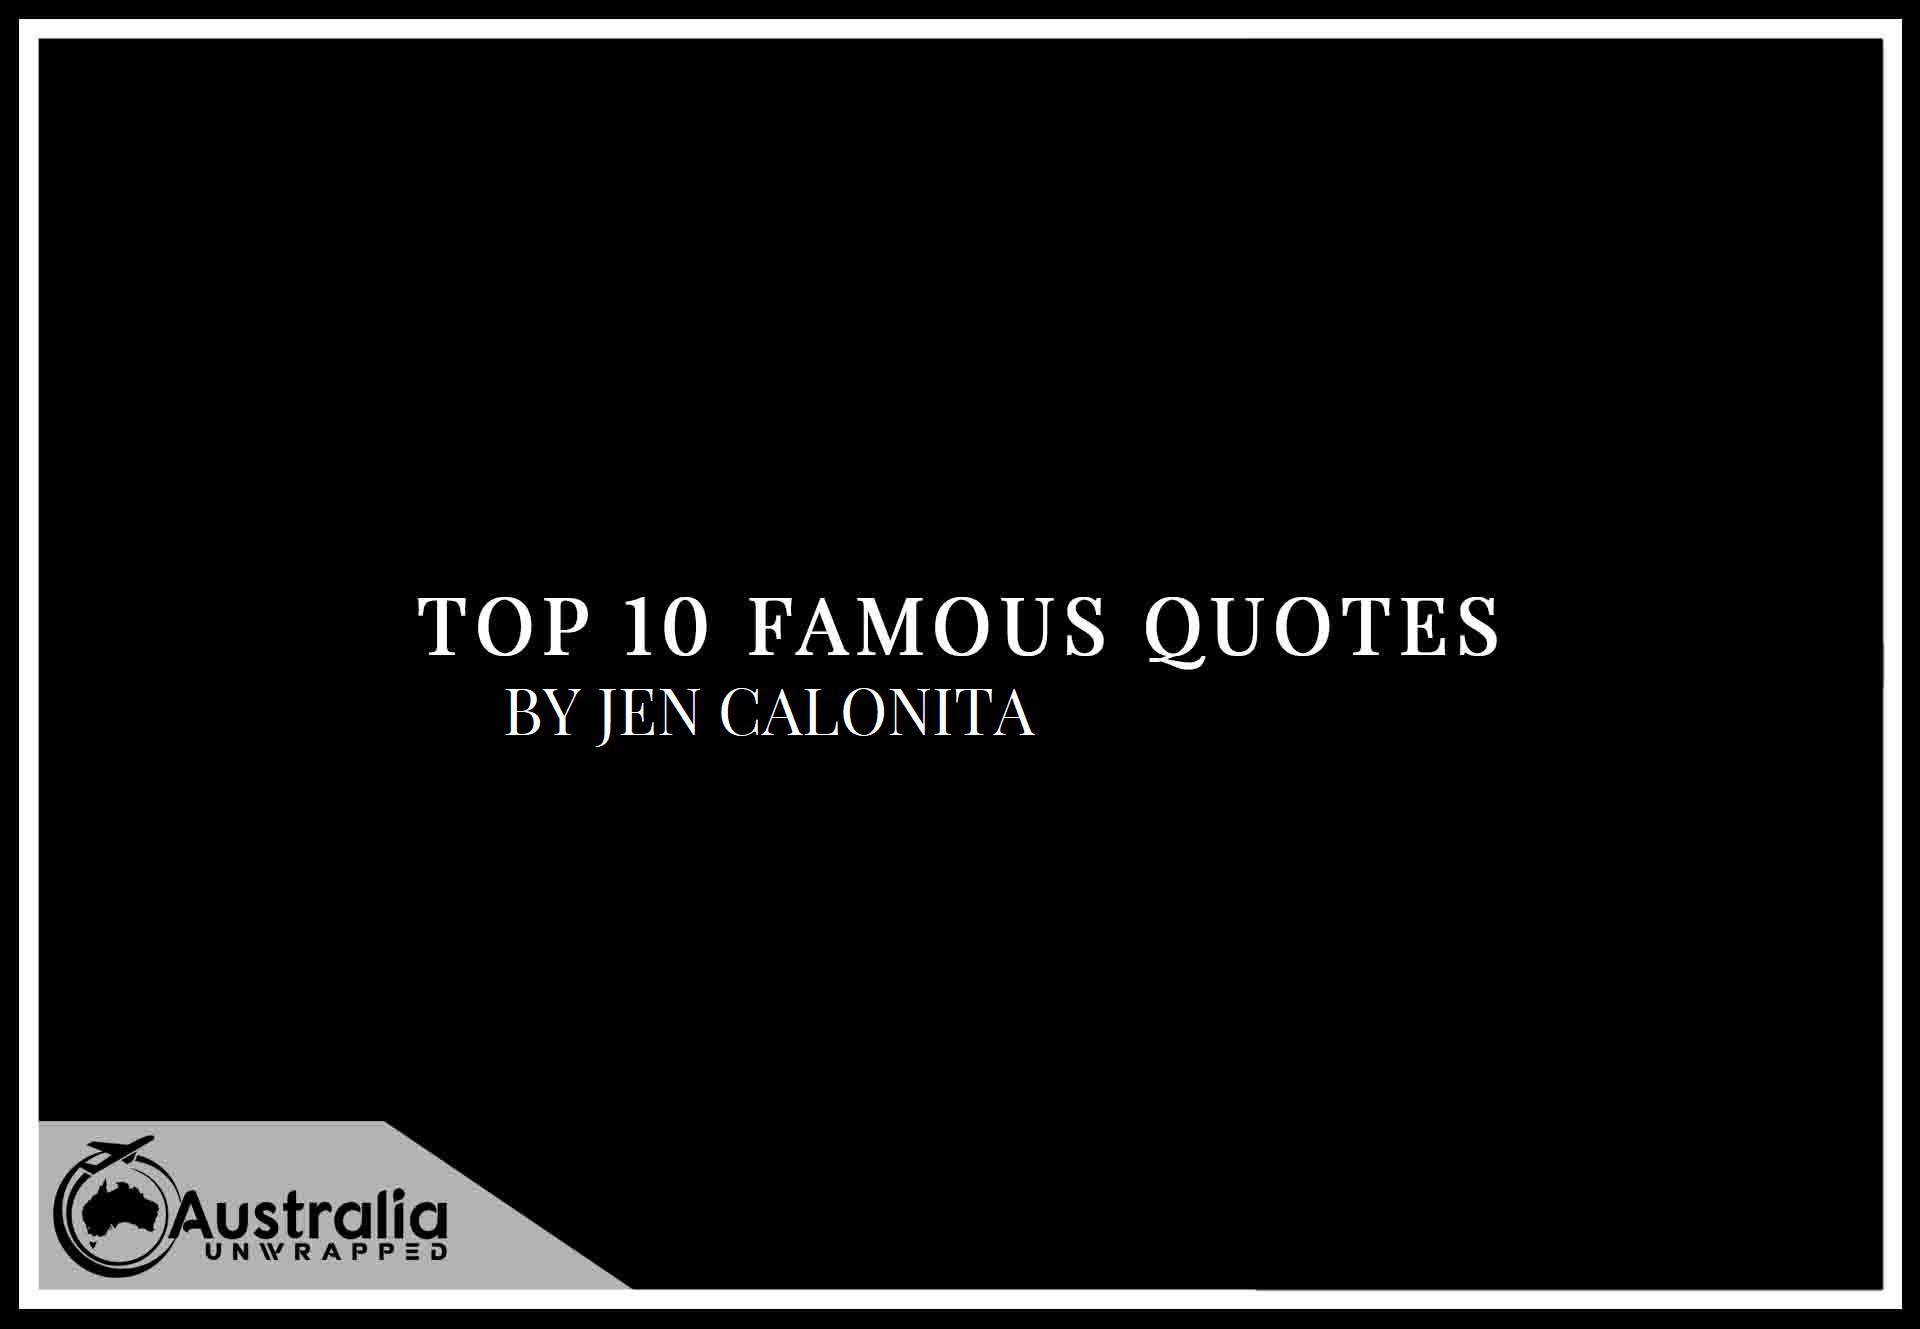 Top 10 Famous Quotes by Author Jen Calonita